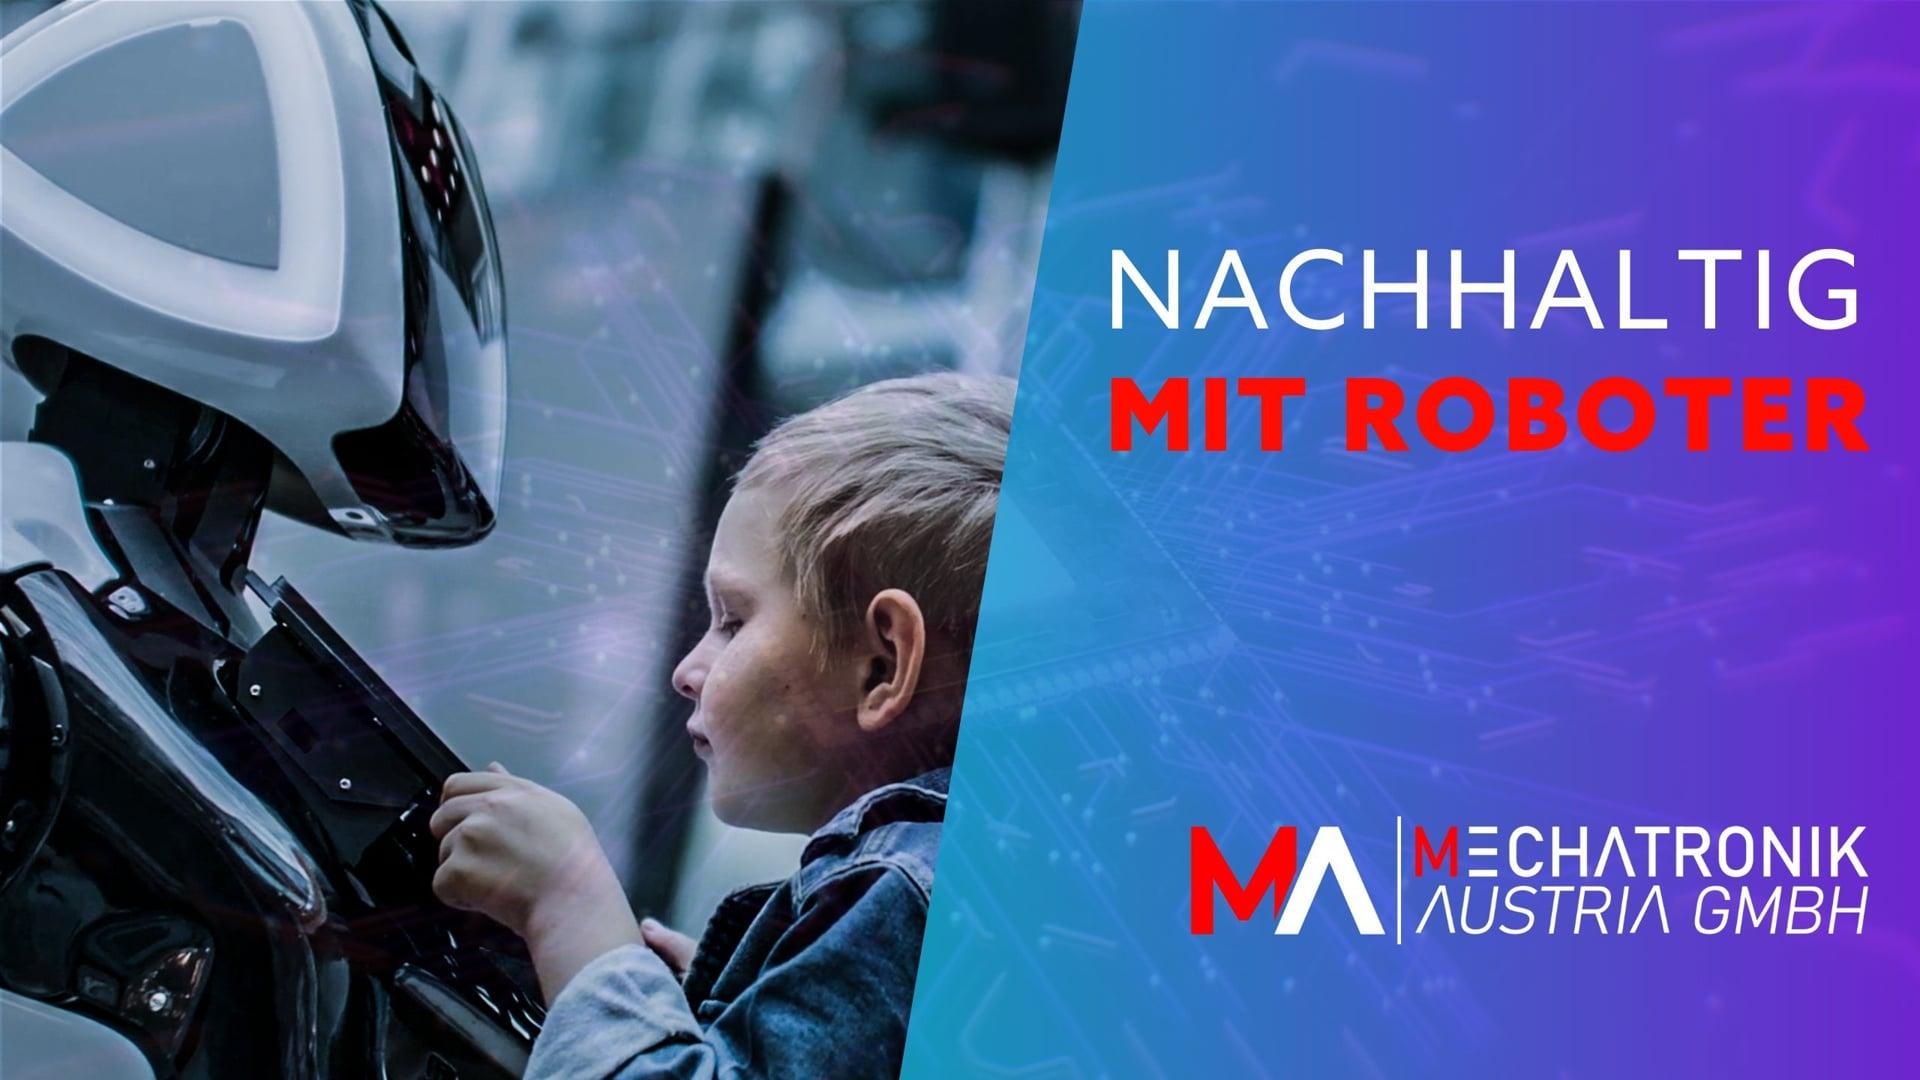 Mechatronik-Austria